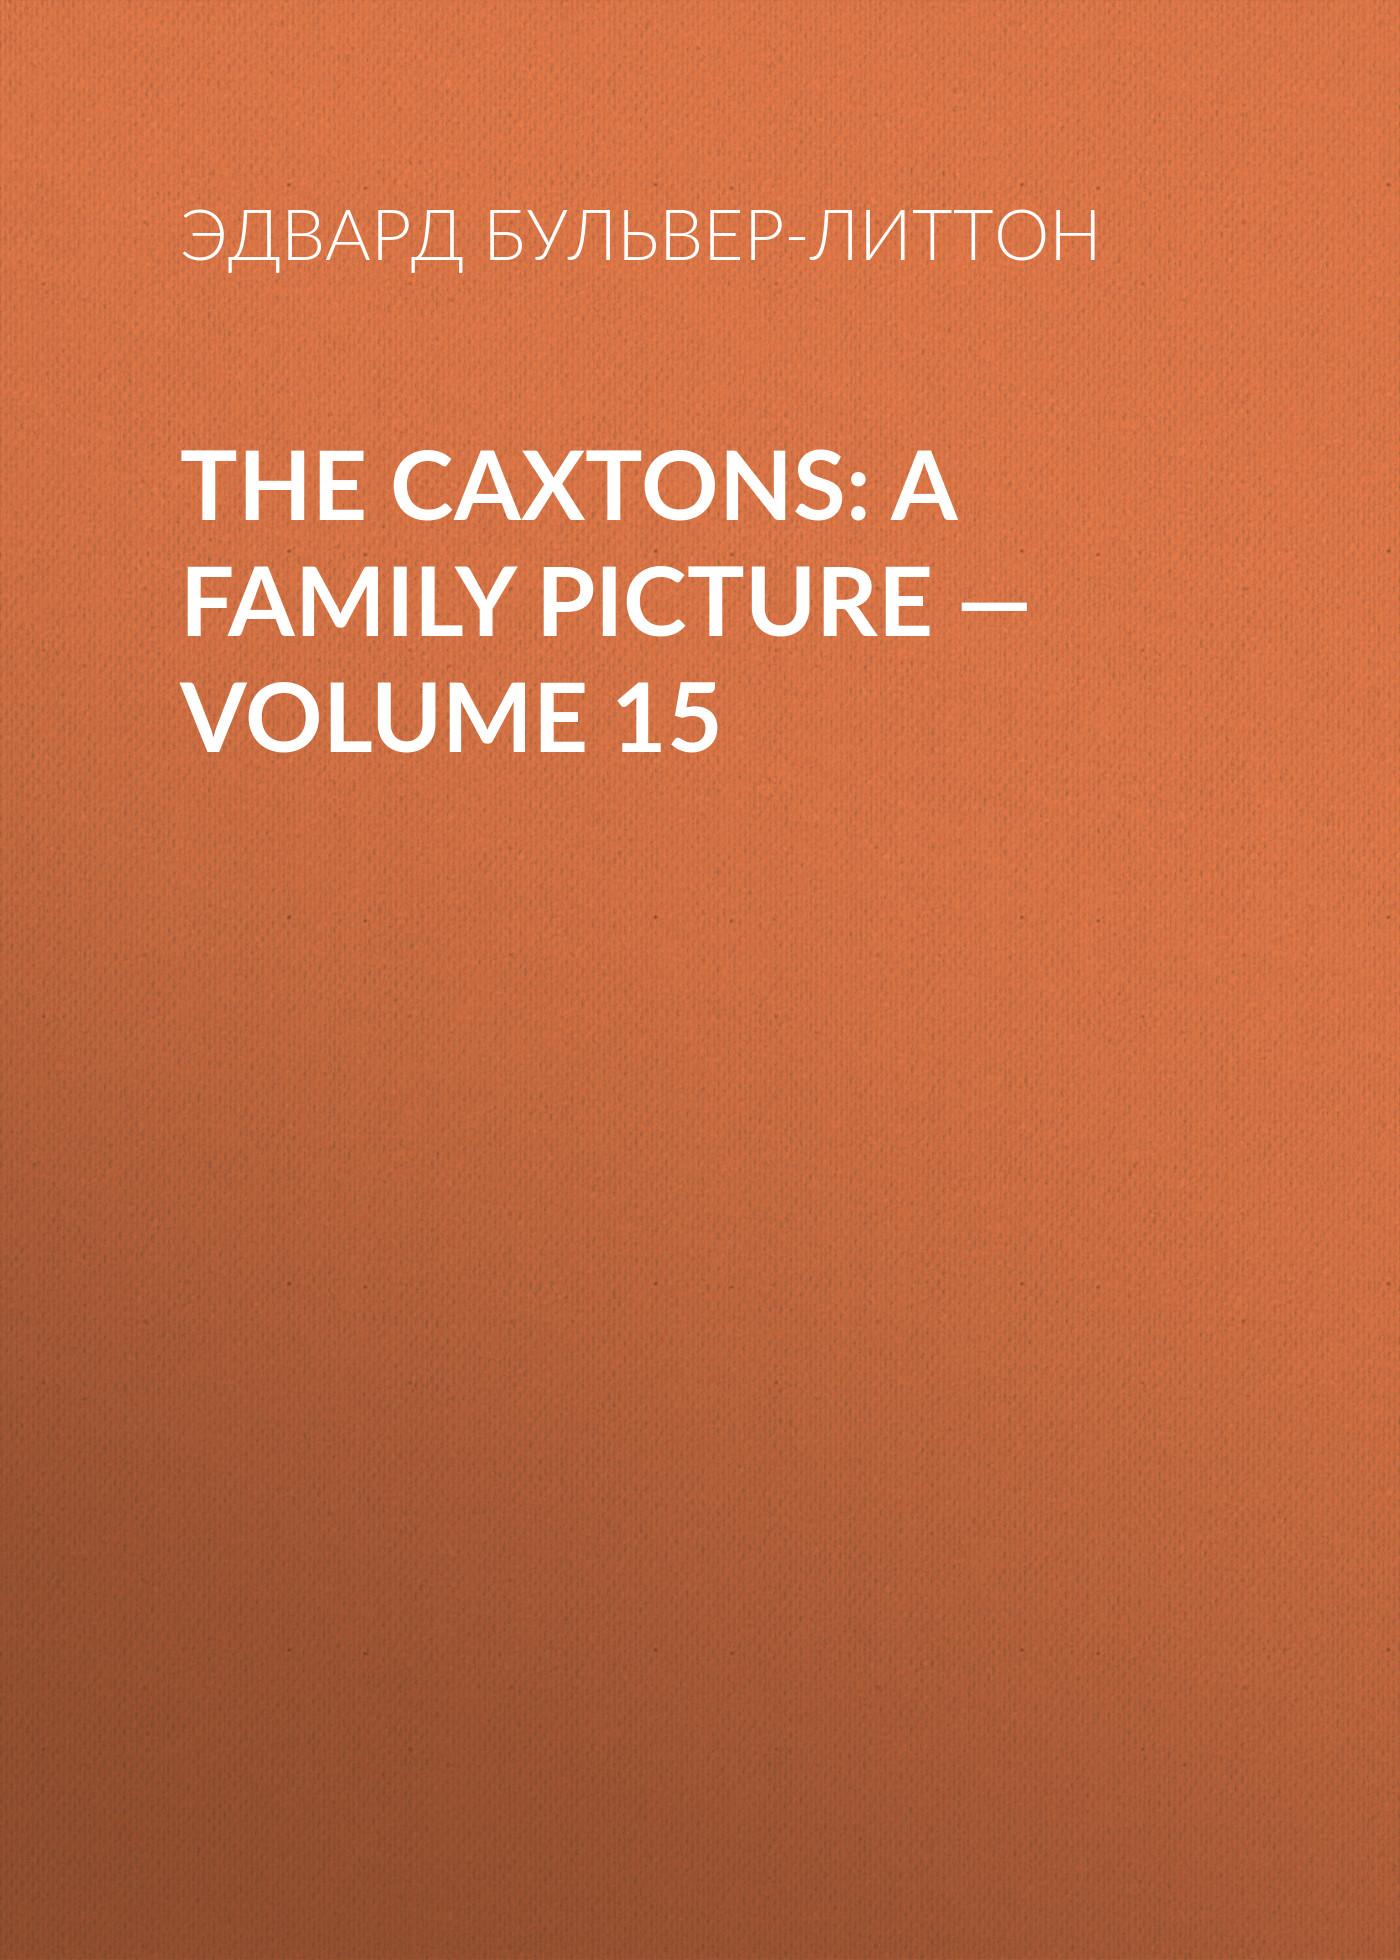 Эдвард Бульвер-Литтон The Caxtons: A Family Picture — Volume 15 creepy comics volume 4 family values